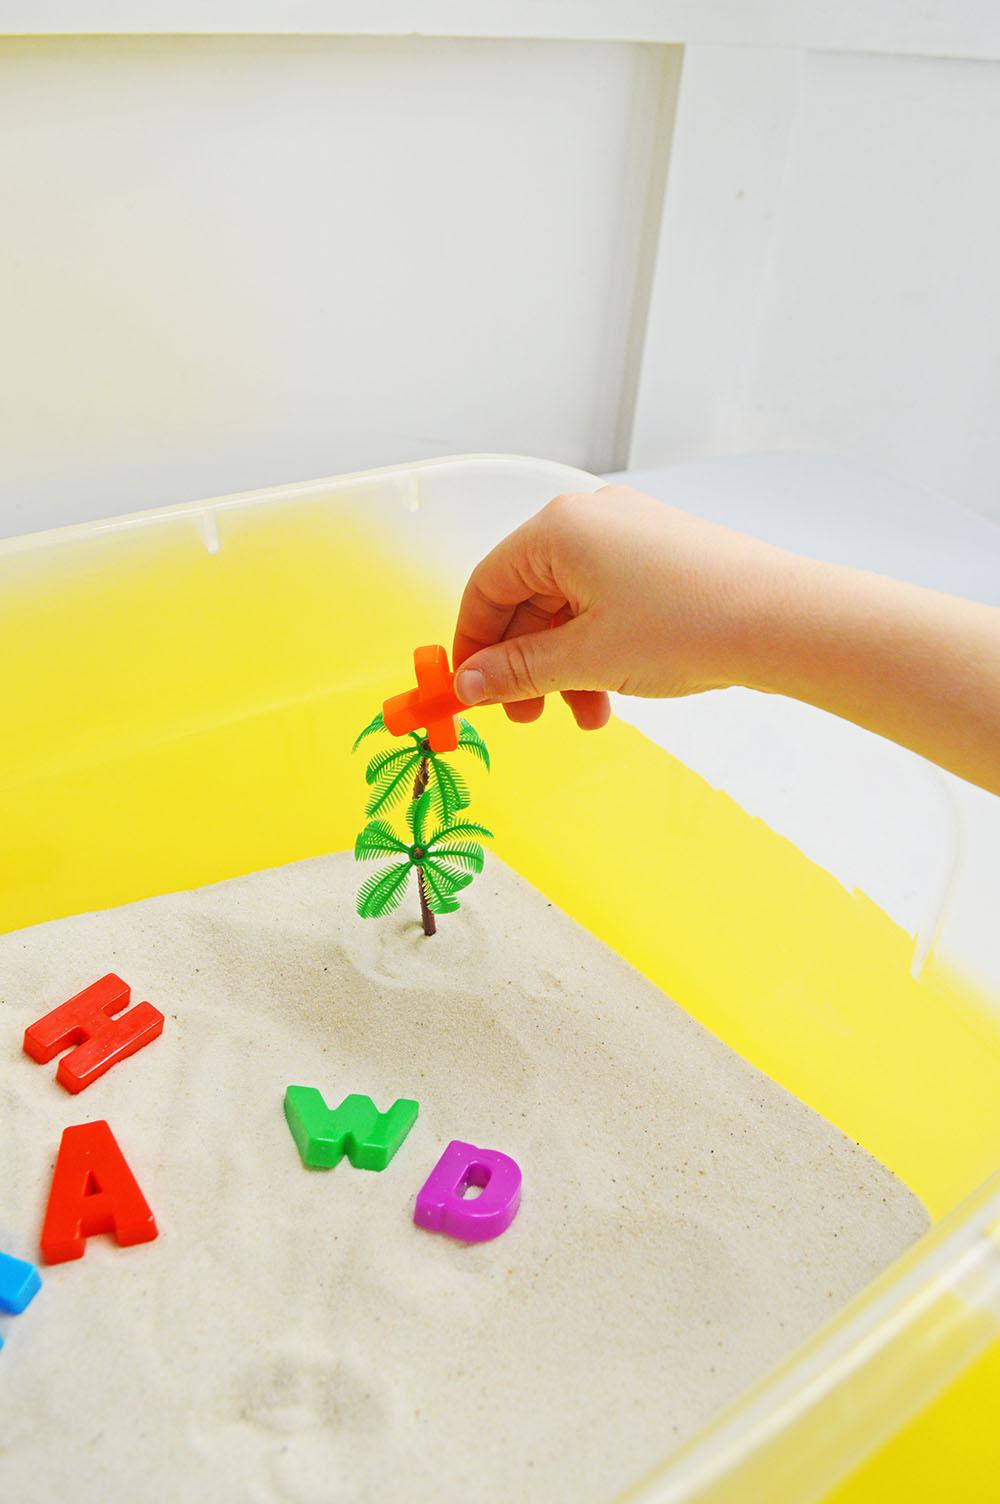 Child's Hands in Sensory Bin